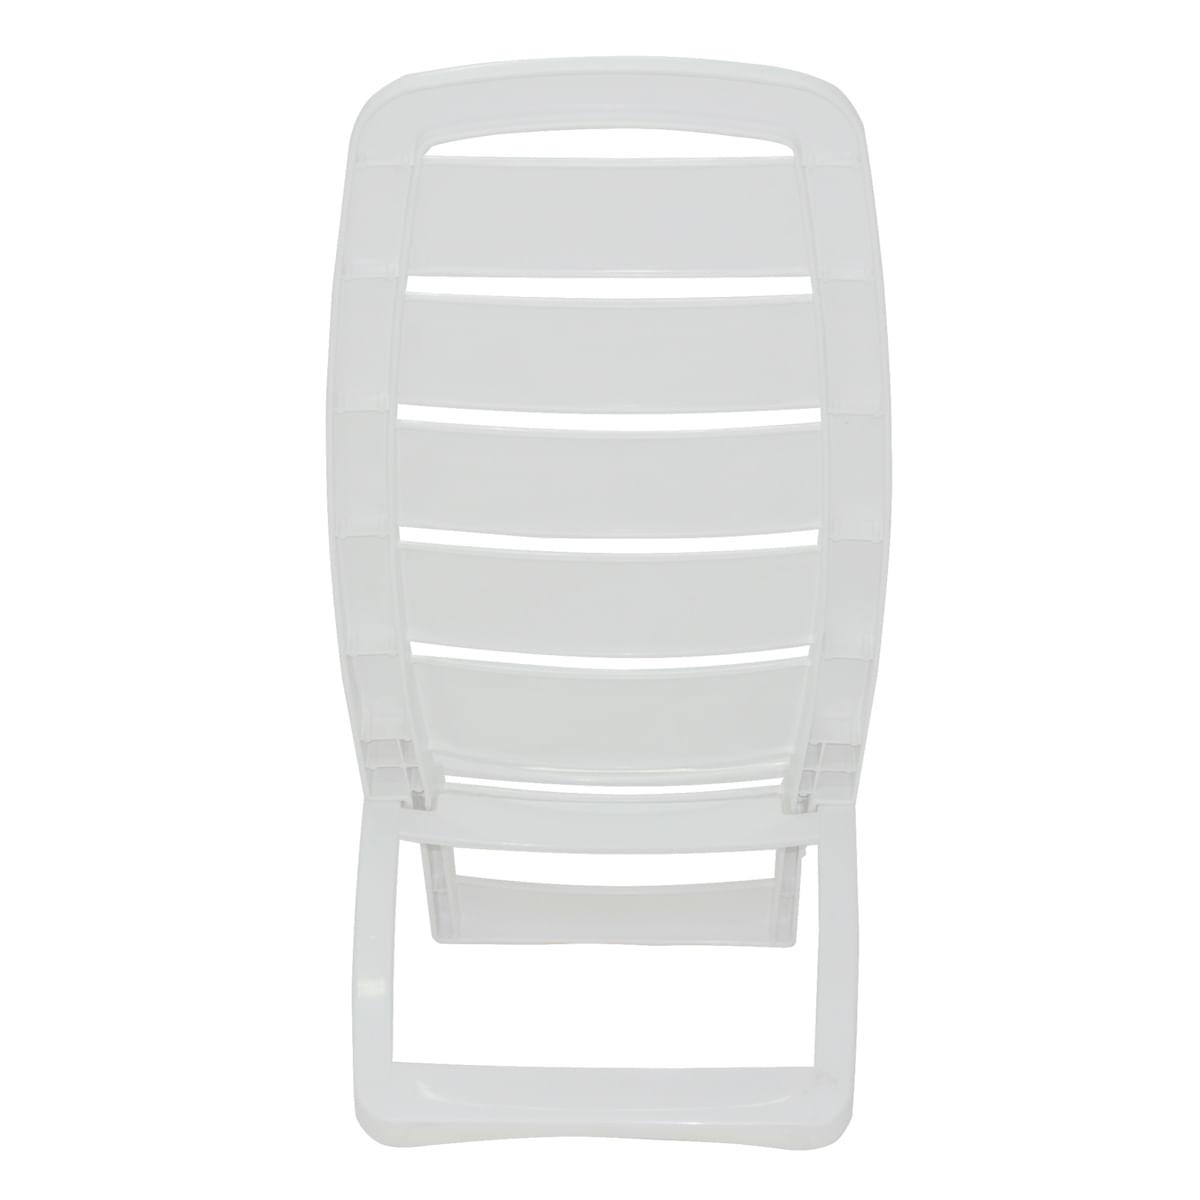 Cadeira Dobrável Tramontina Guarujá em Polipropileno Branco